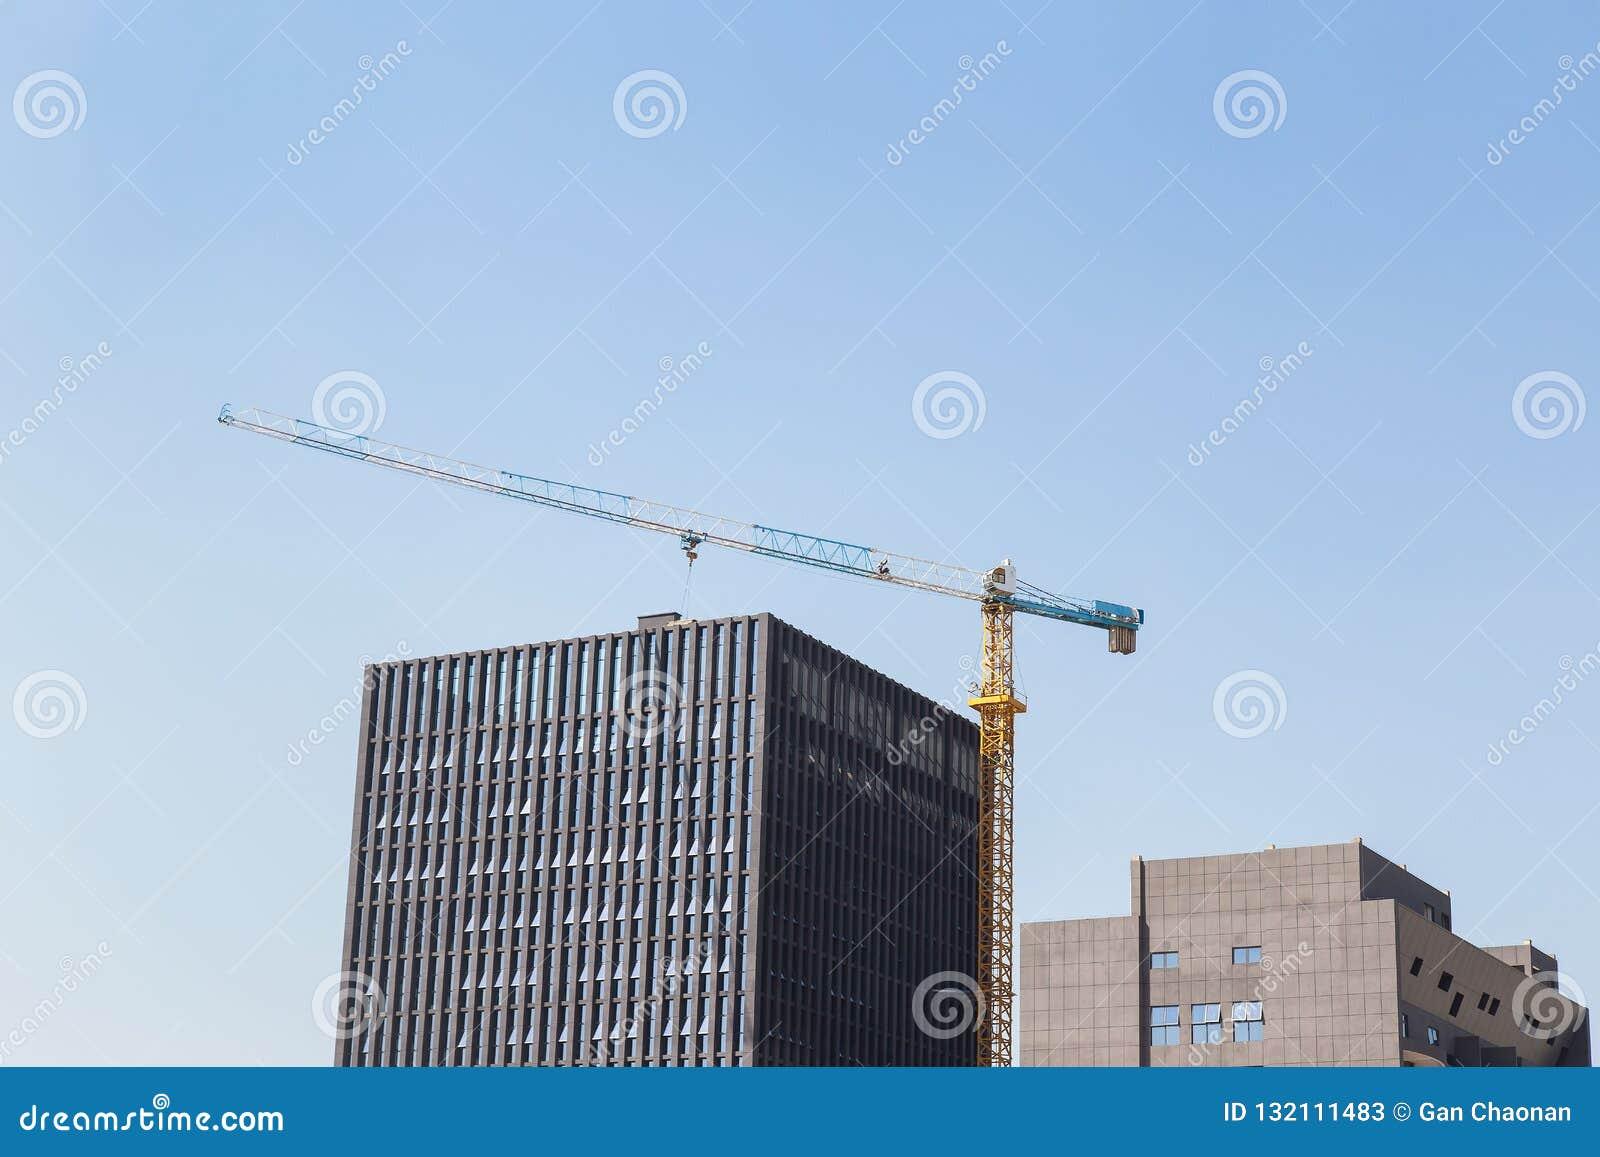 Construction site background.